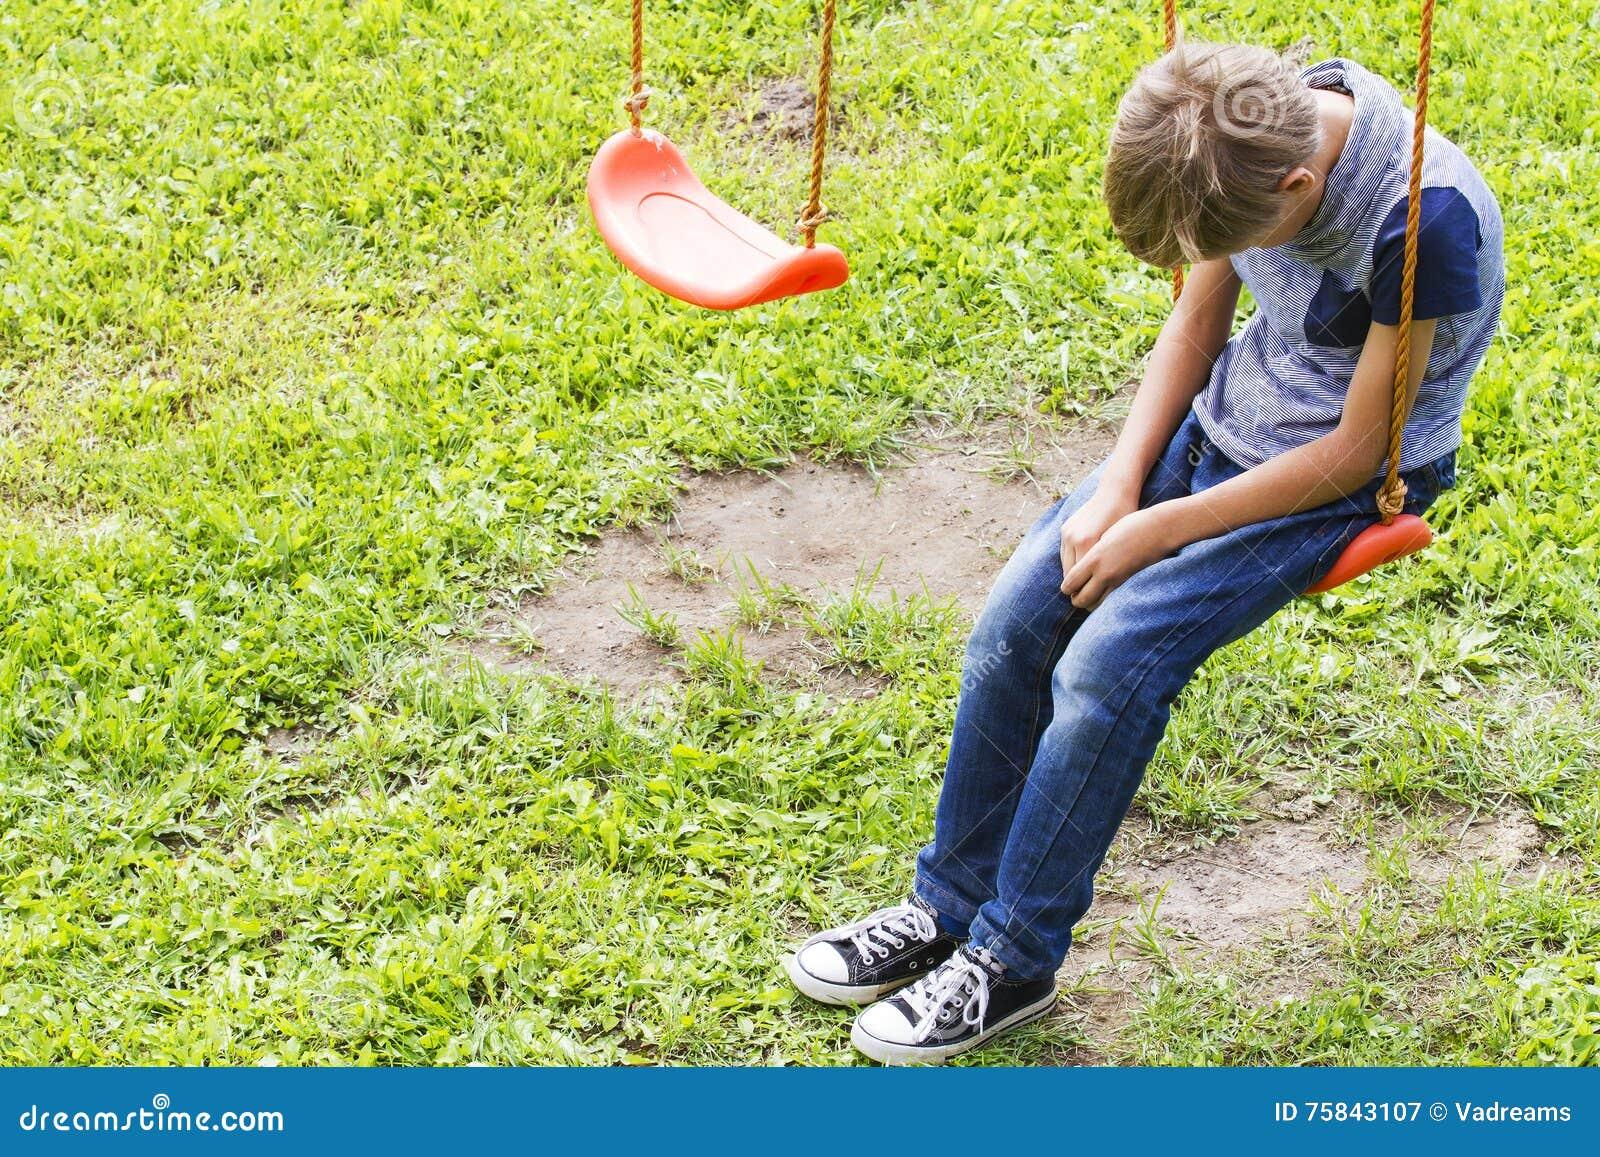 Sad lonely boy sitting on swings